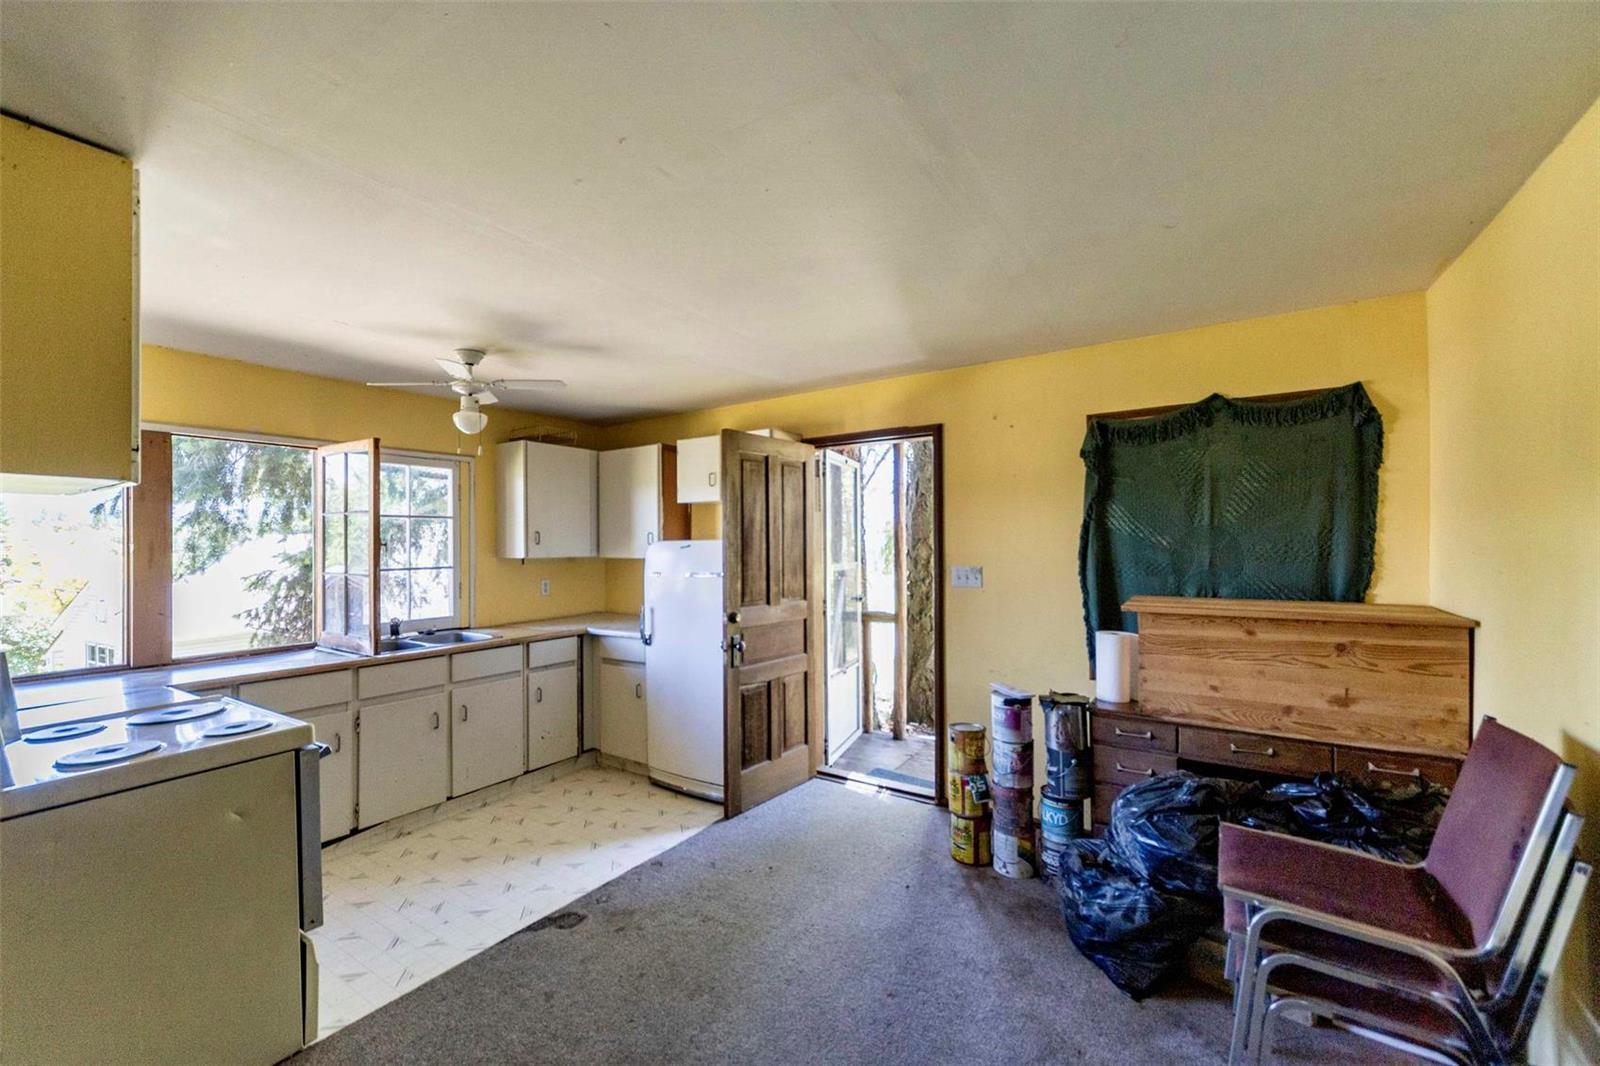 4602 Schubert Road,, Armstrong, British Columbia  V0E 1B4 - Photo 38 - 10232684